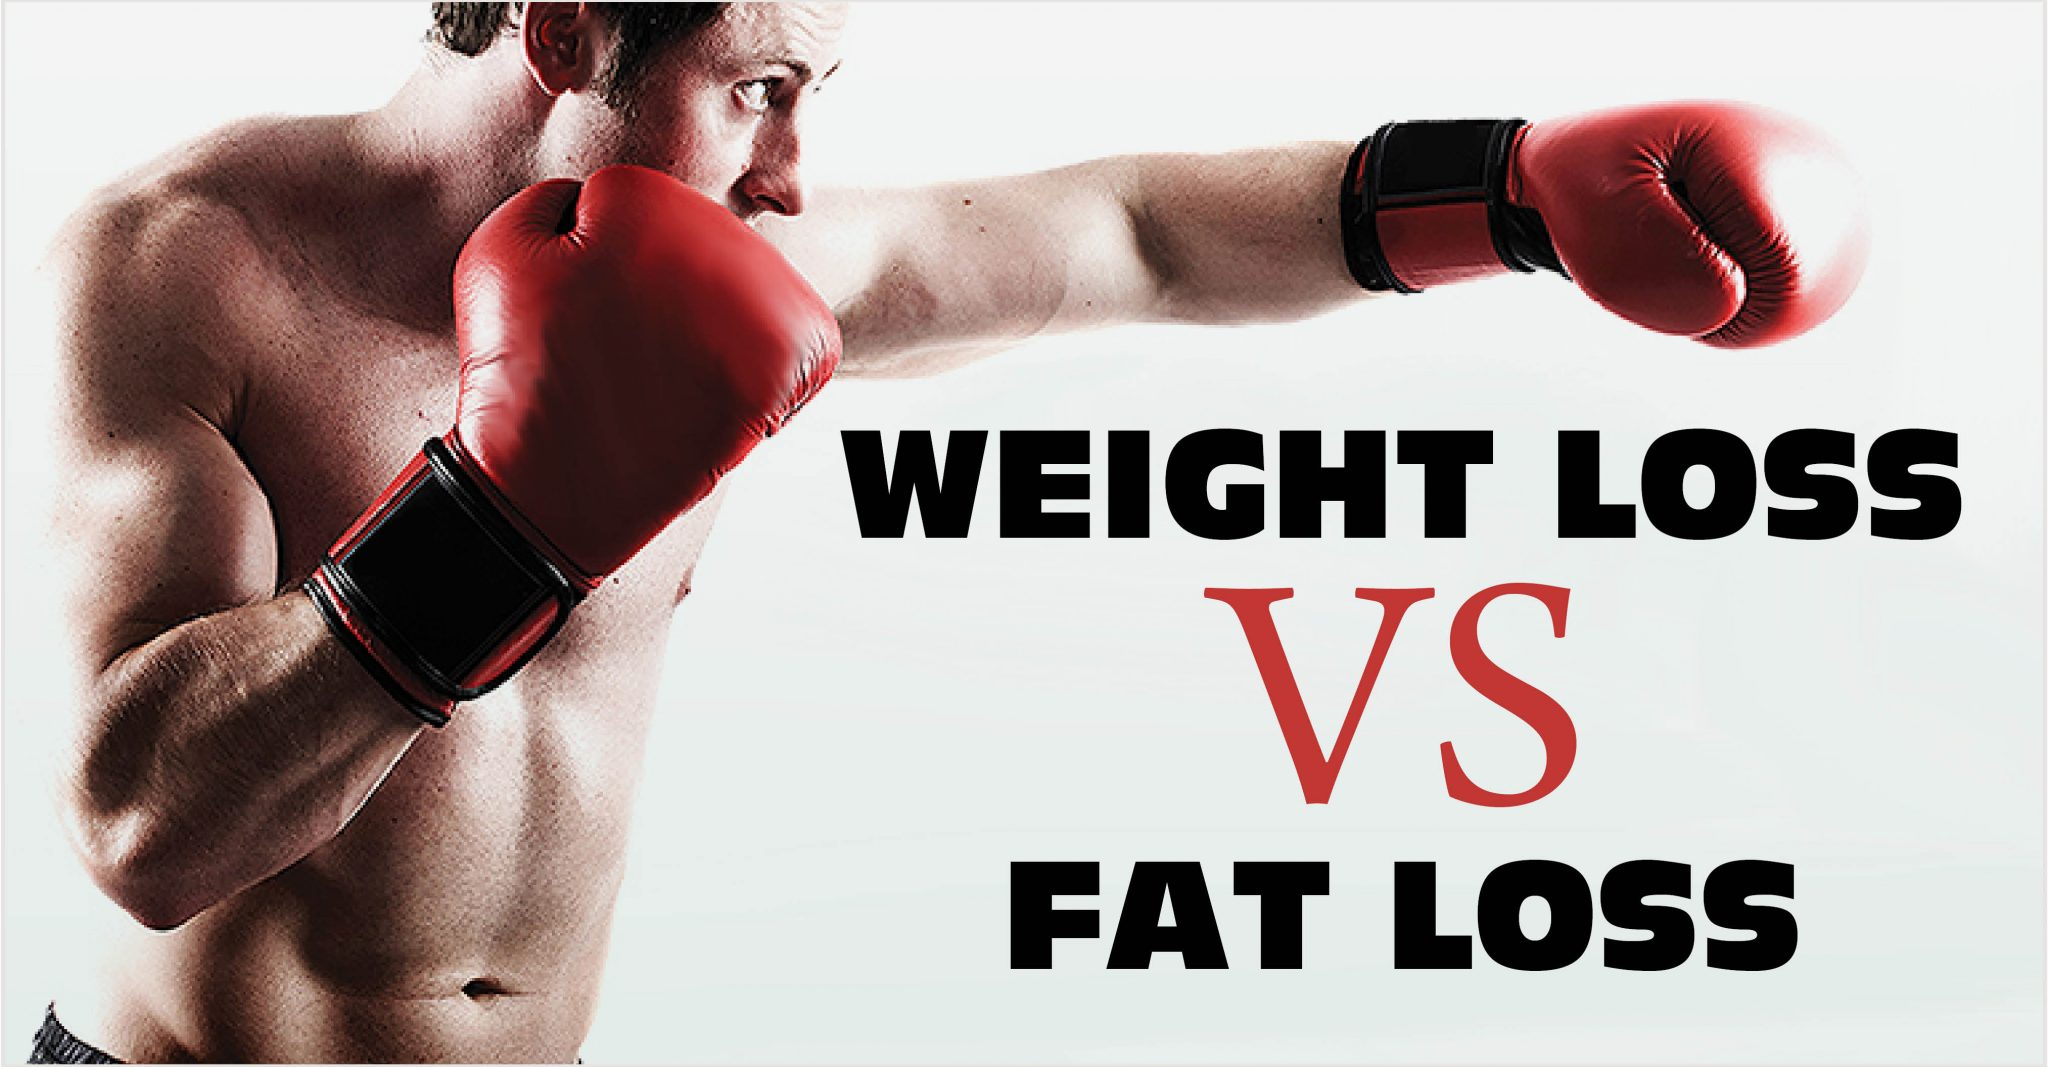 poate vaping ajuta u pierde in greutate